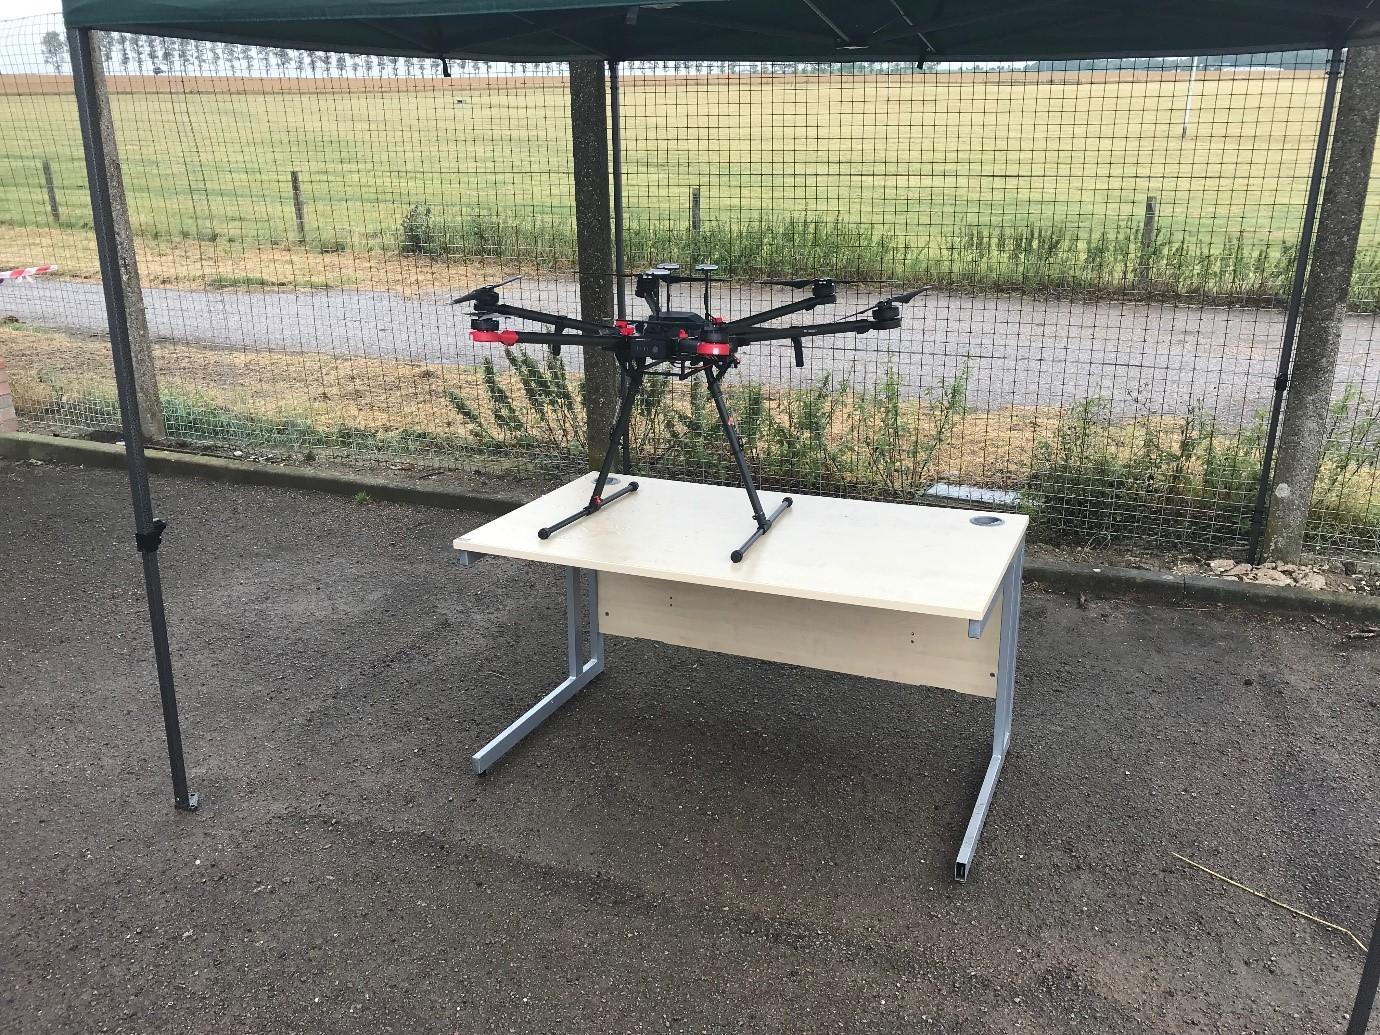 A new drone at Baldock